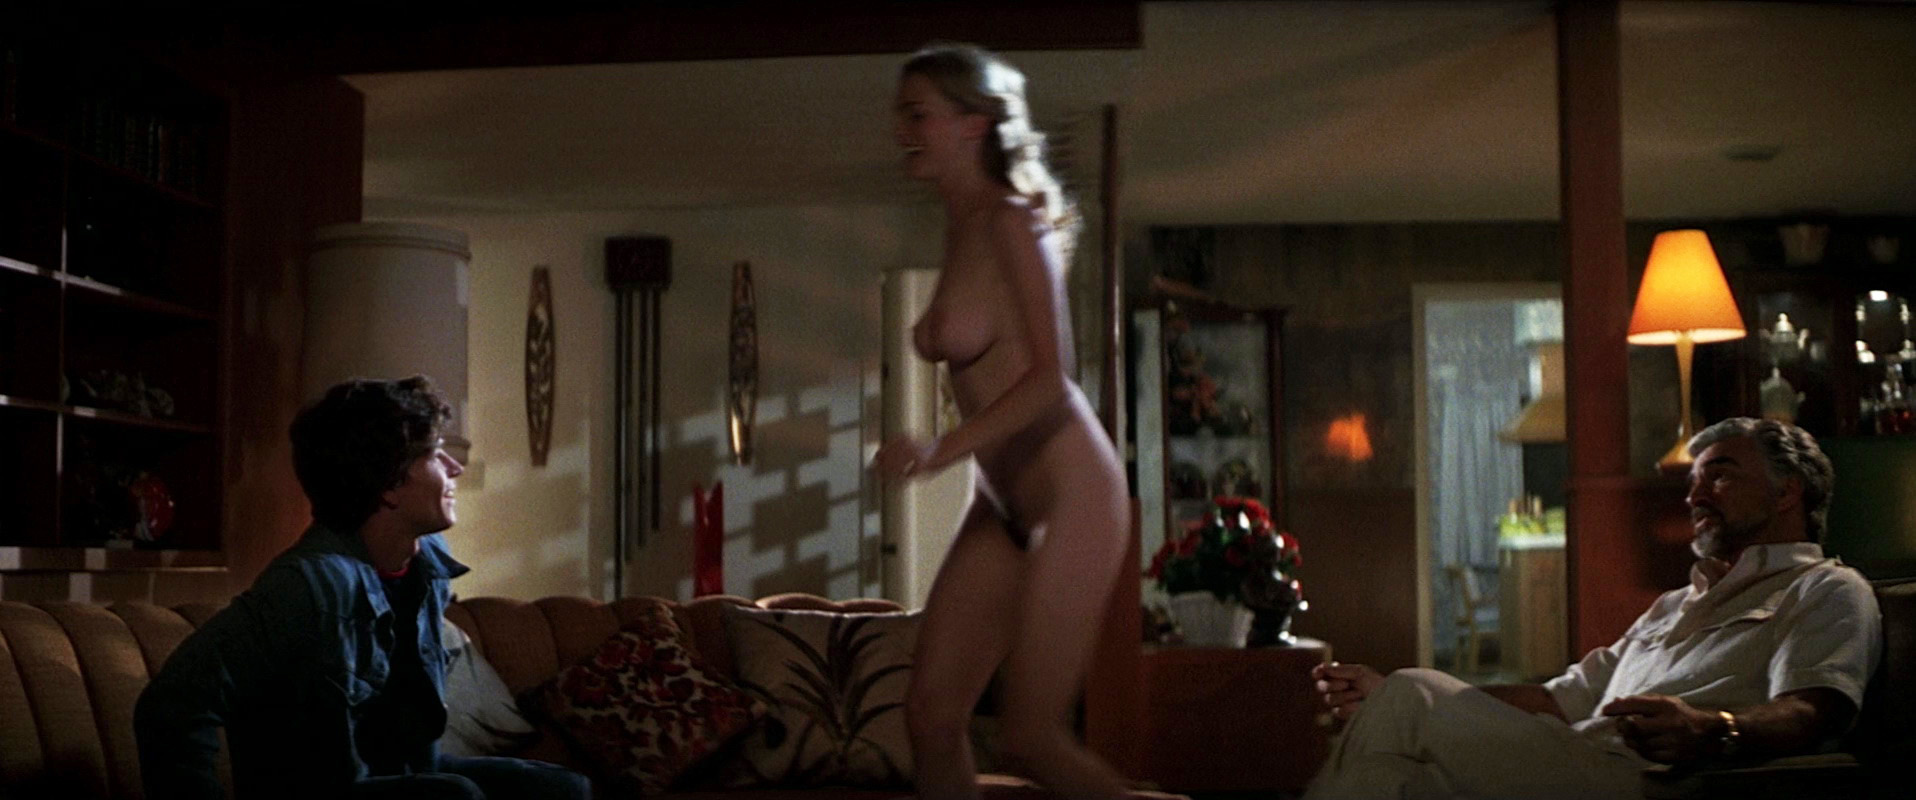 Sexy real mom pics nude